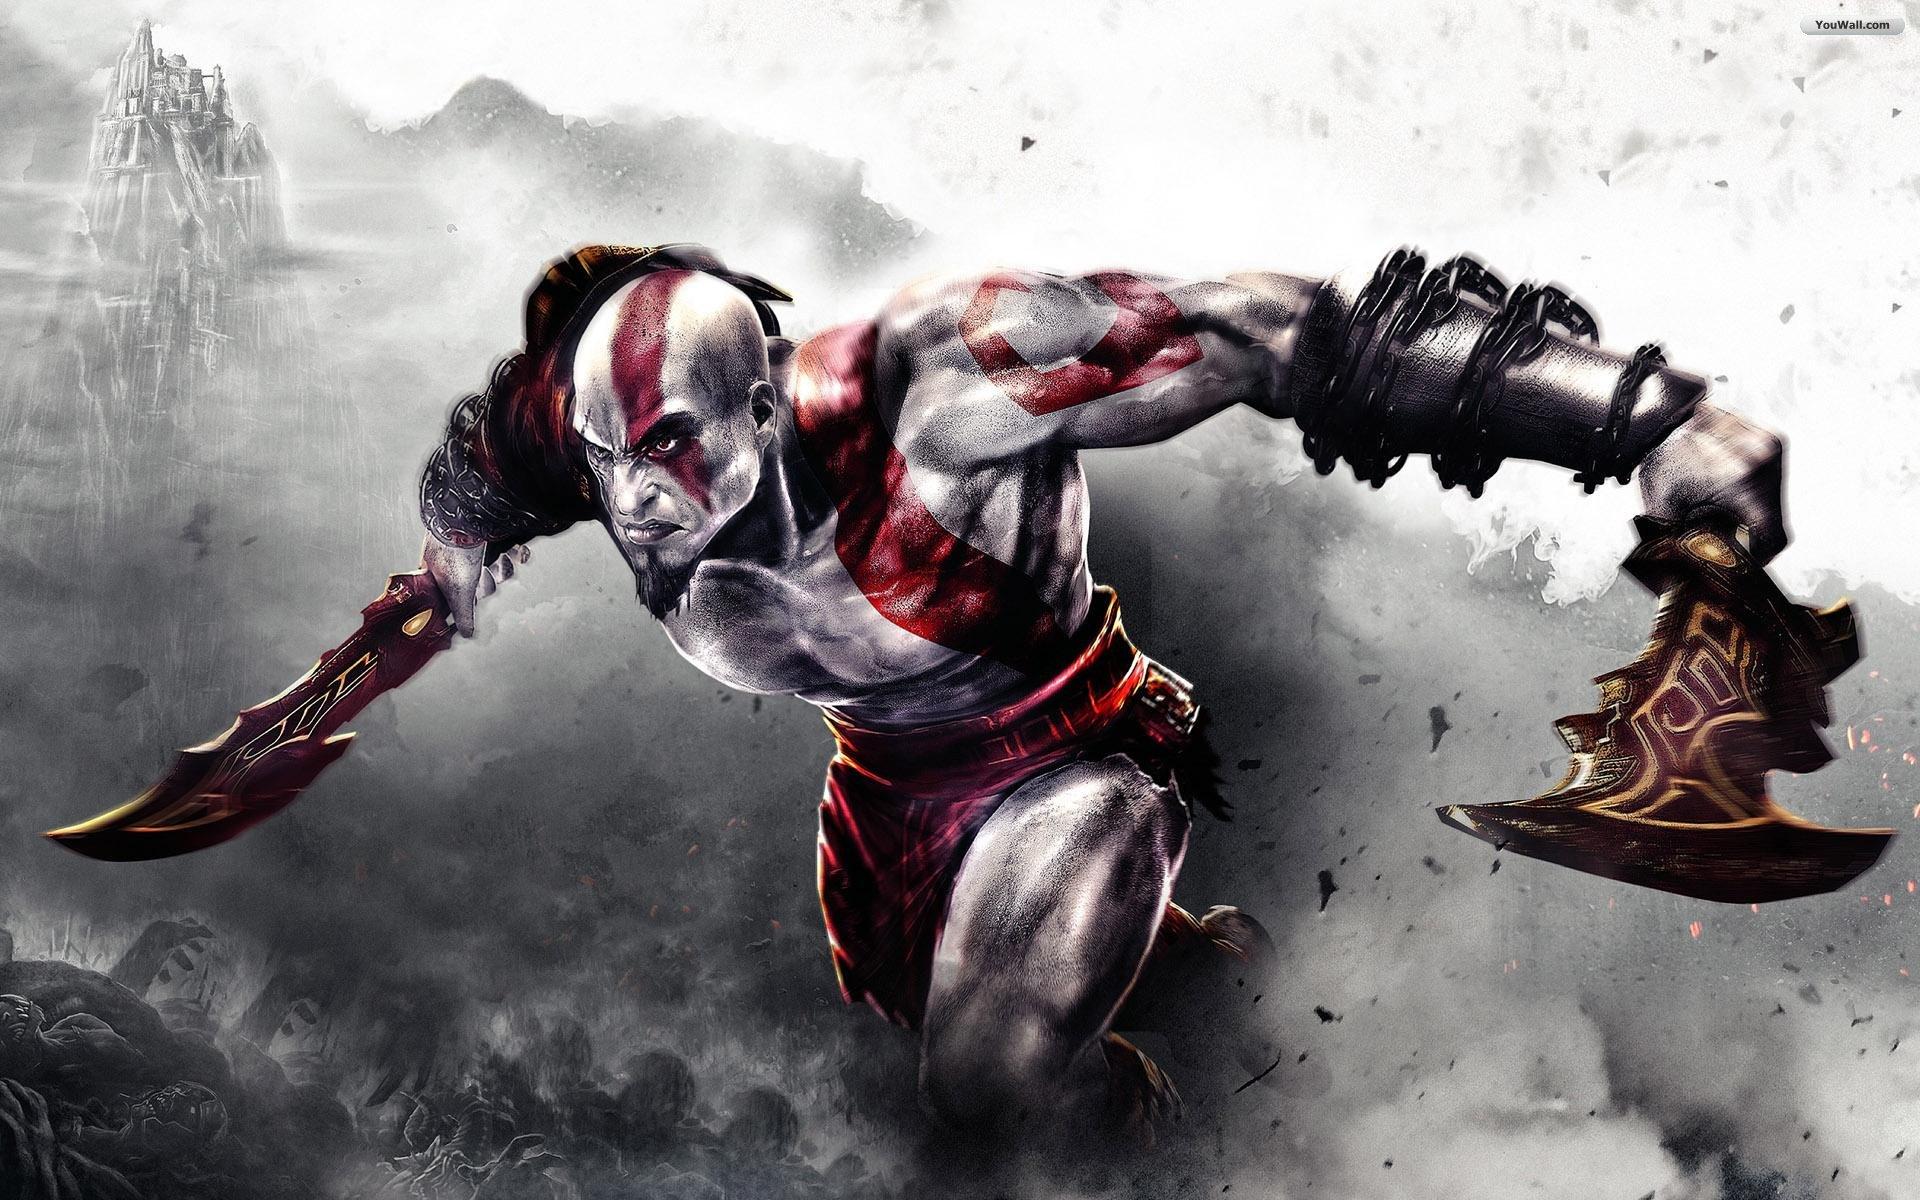 kratos-gow3-desktop.jpg (503899 bytes) ...